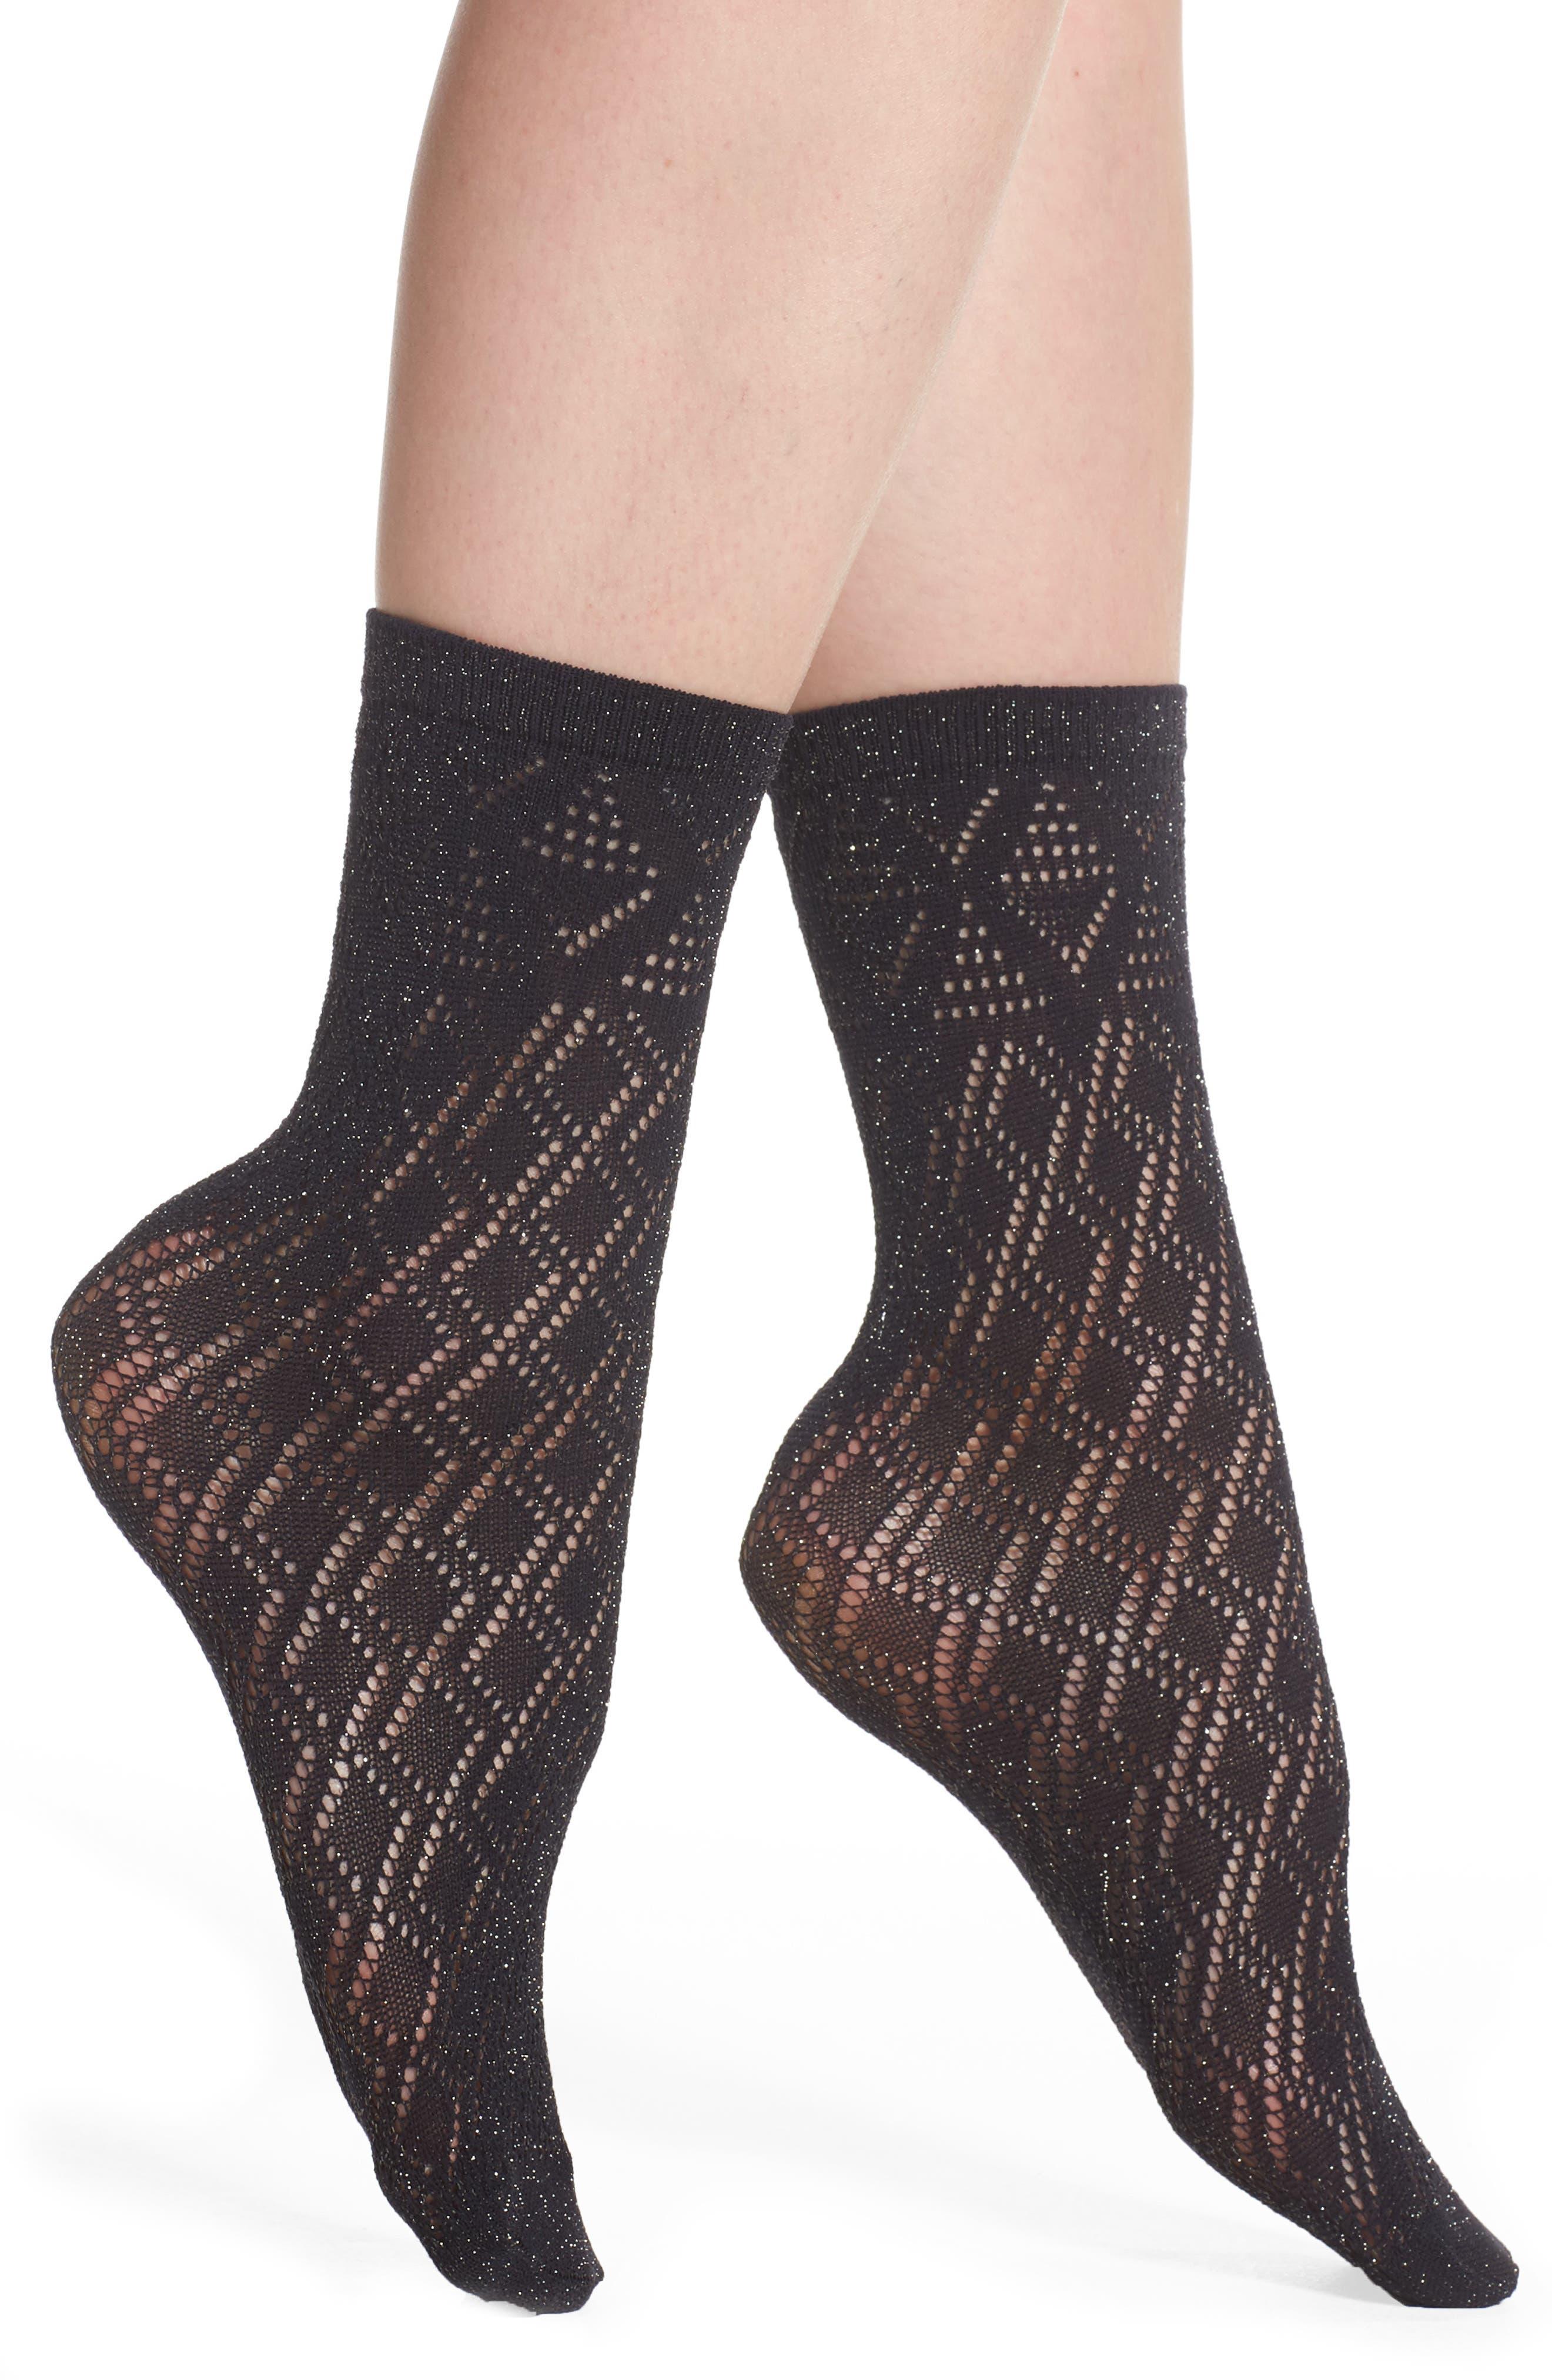 Kathy Trouser Socks,                         Main,                         color, 001